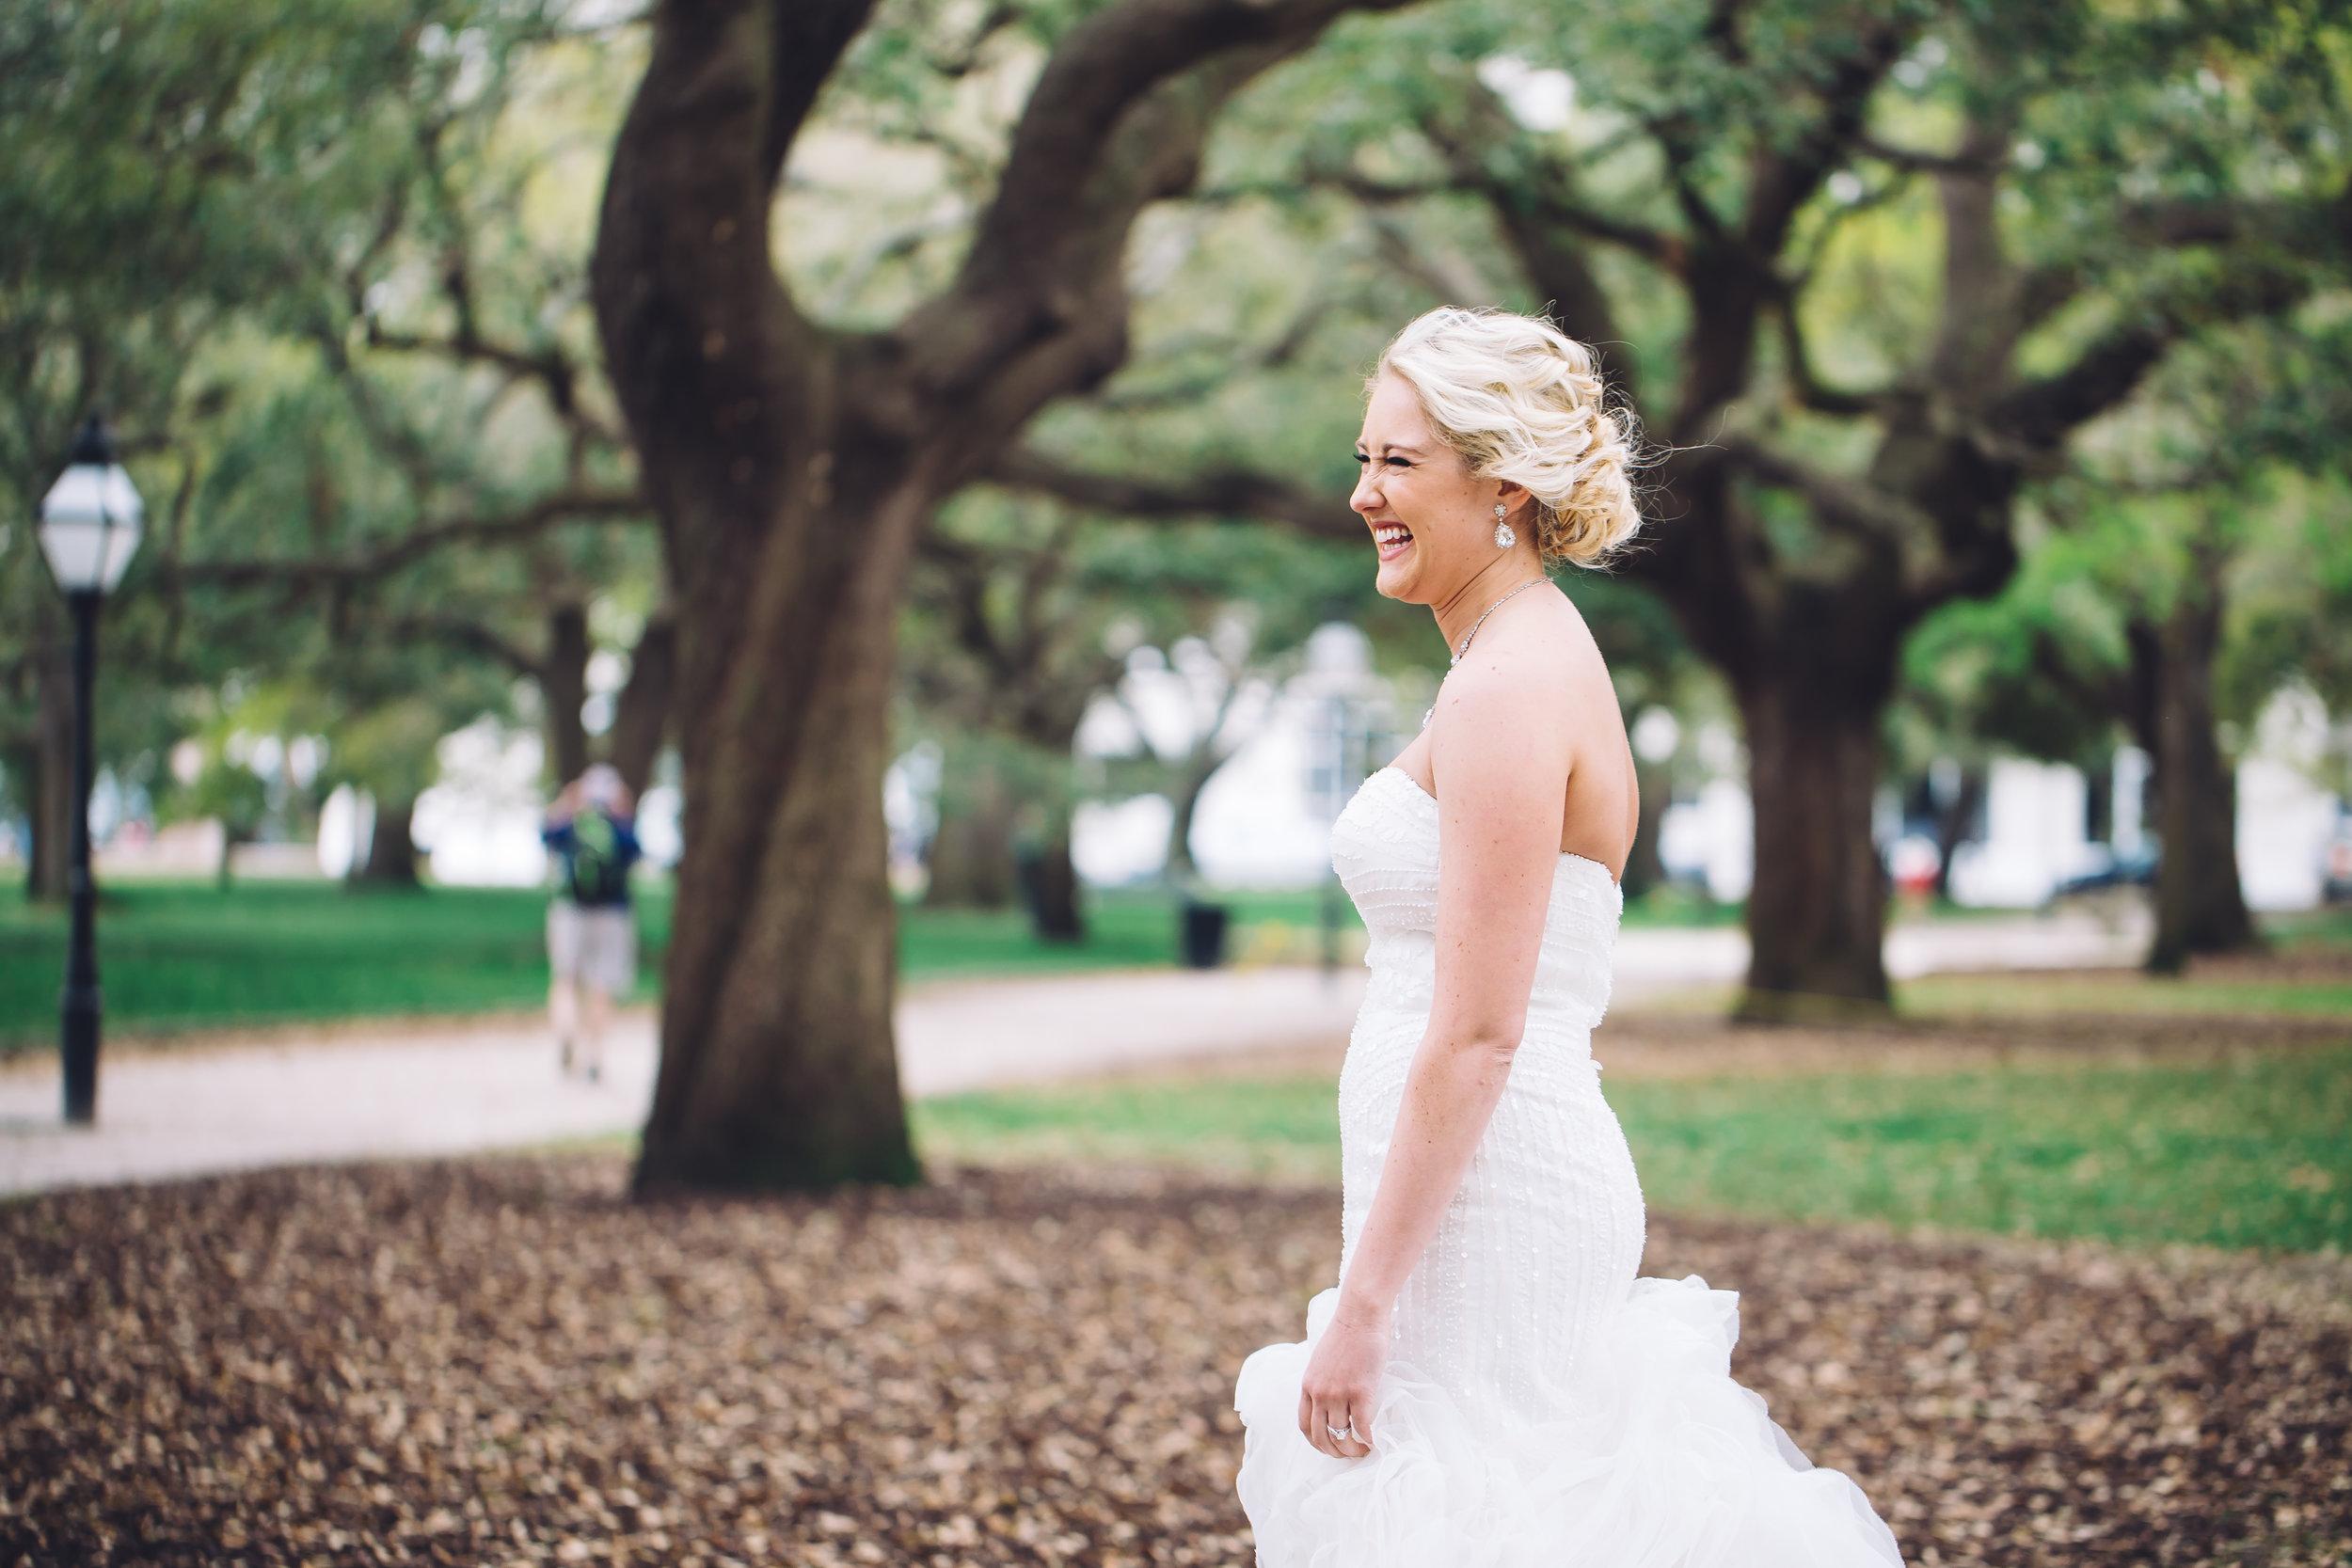 CHARLESTON WEDDING PHOTOGRAPHY, WILD DUNES WEDDING, BEST CHARLESTON WEDDING PHOTOGRAPHERS, CHARLESTON DESTINATION WEDDING, MOUNT PLEASANT WEDDING, ISLE OF PALMS WEDDING